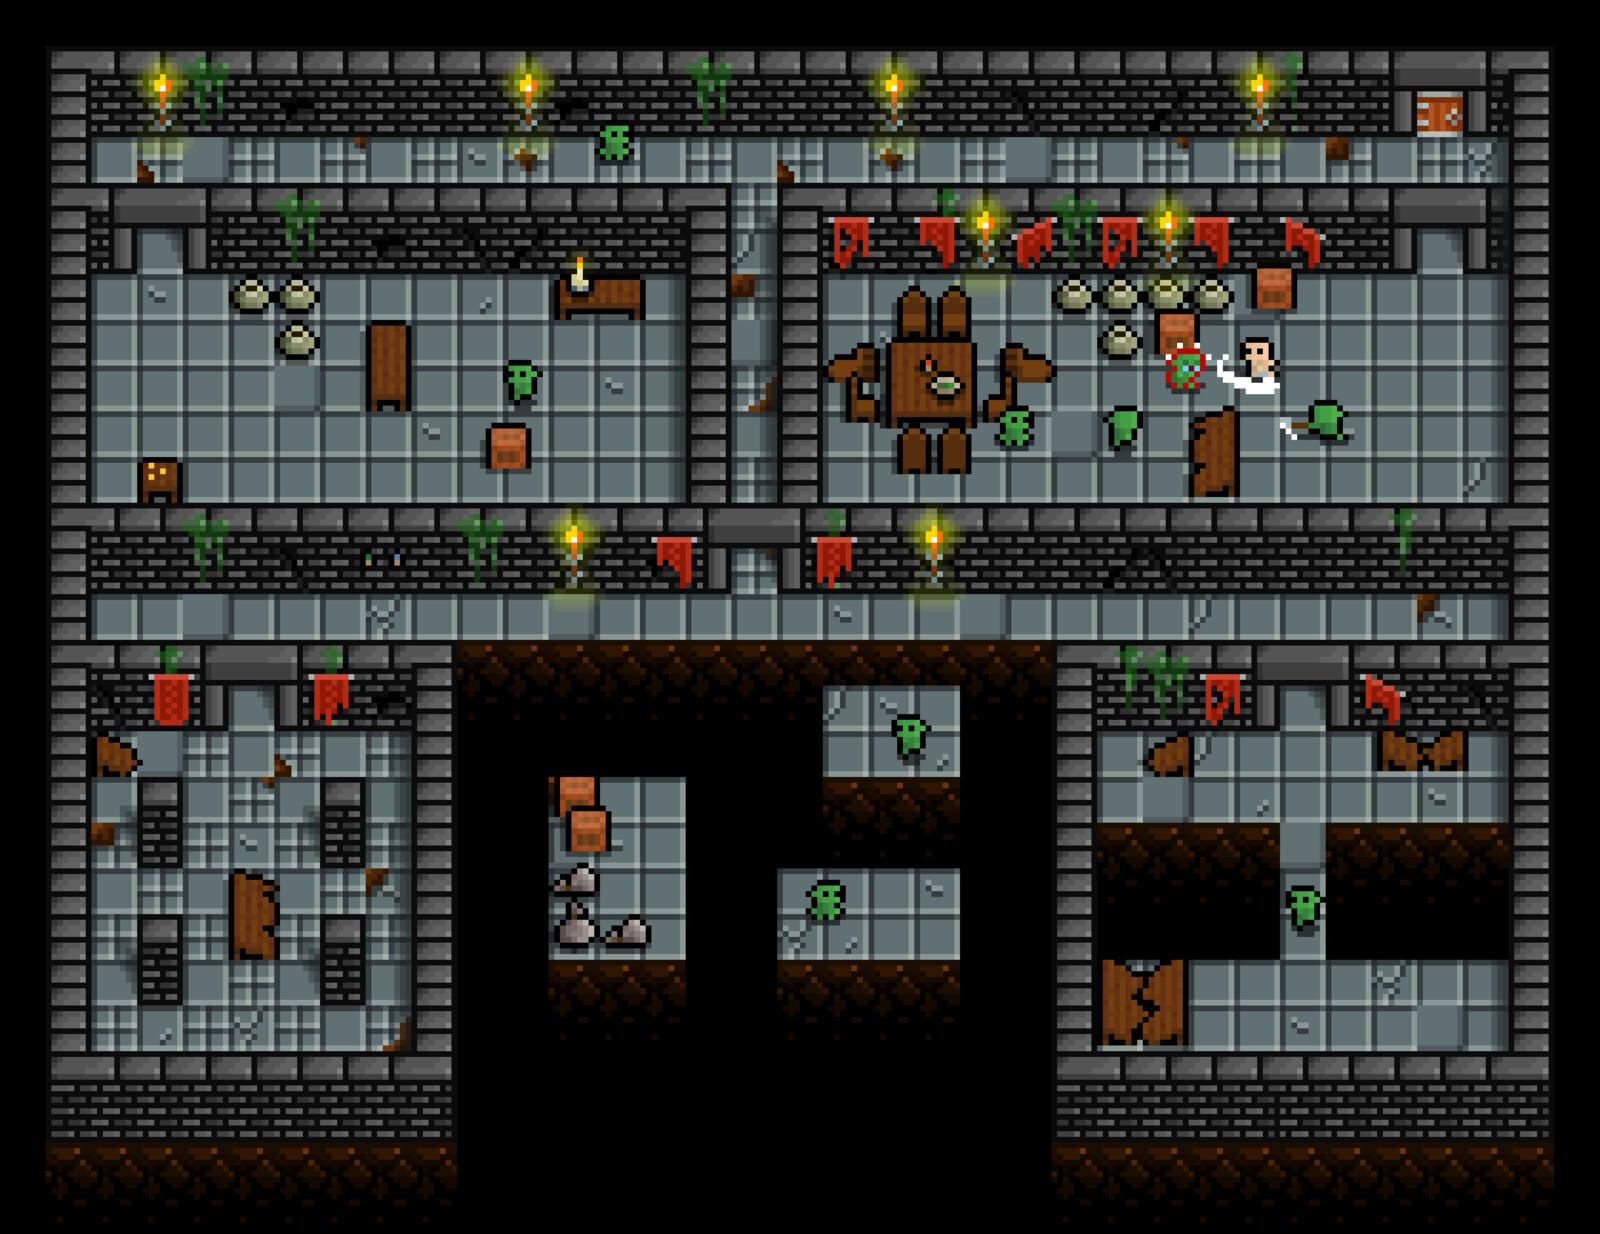 Level sample using Minifantasy - Dungeon tileset